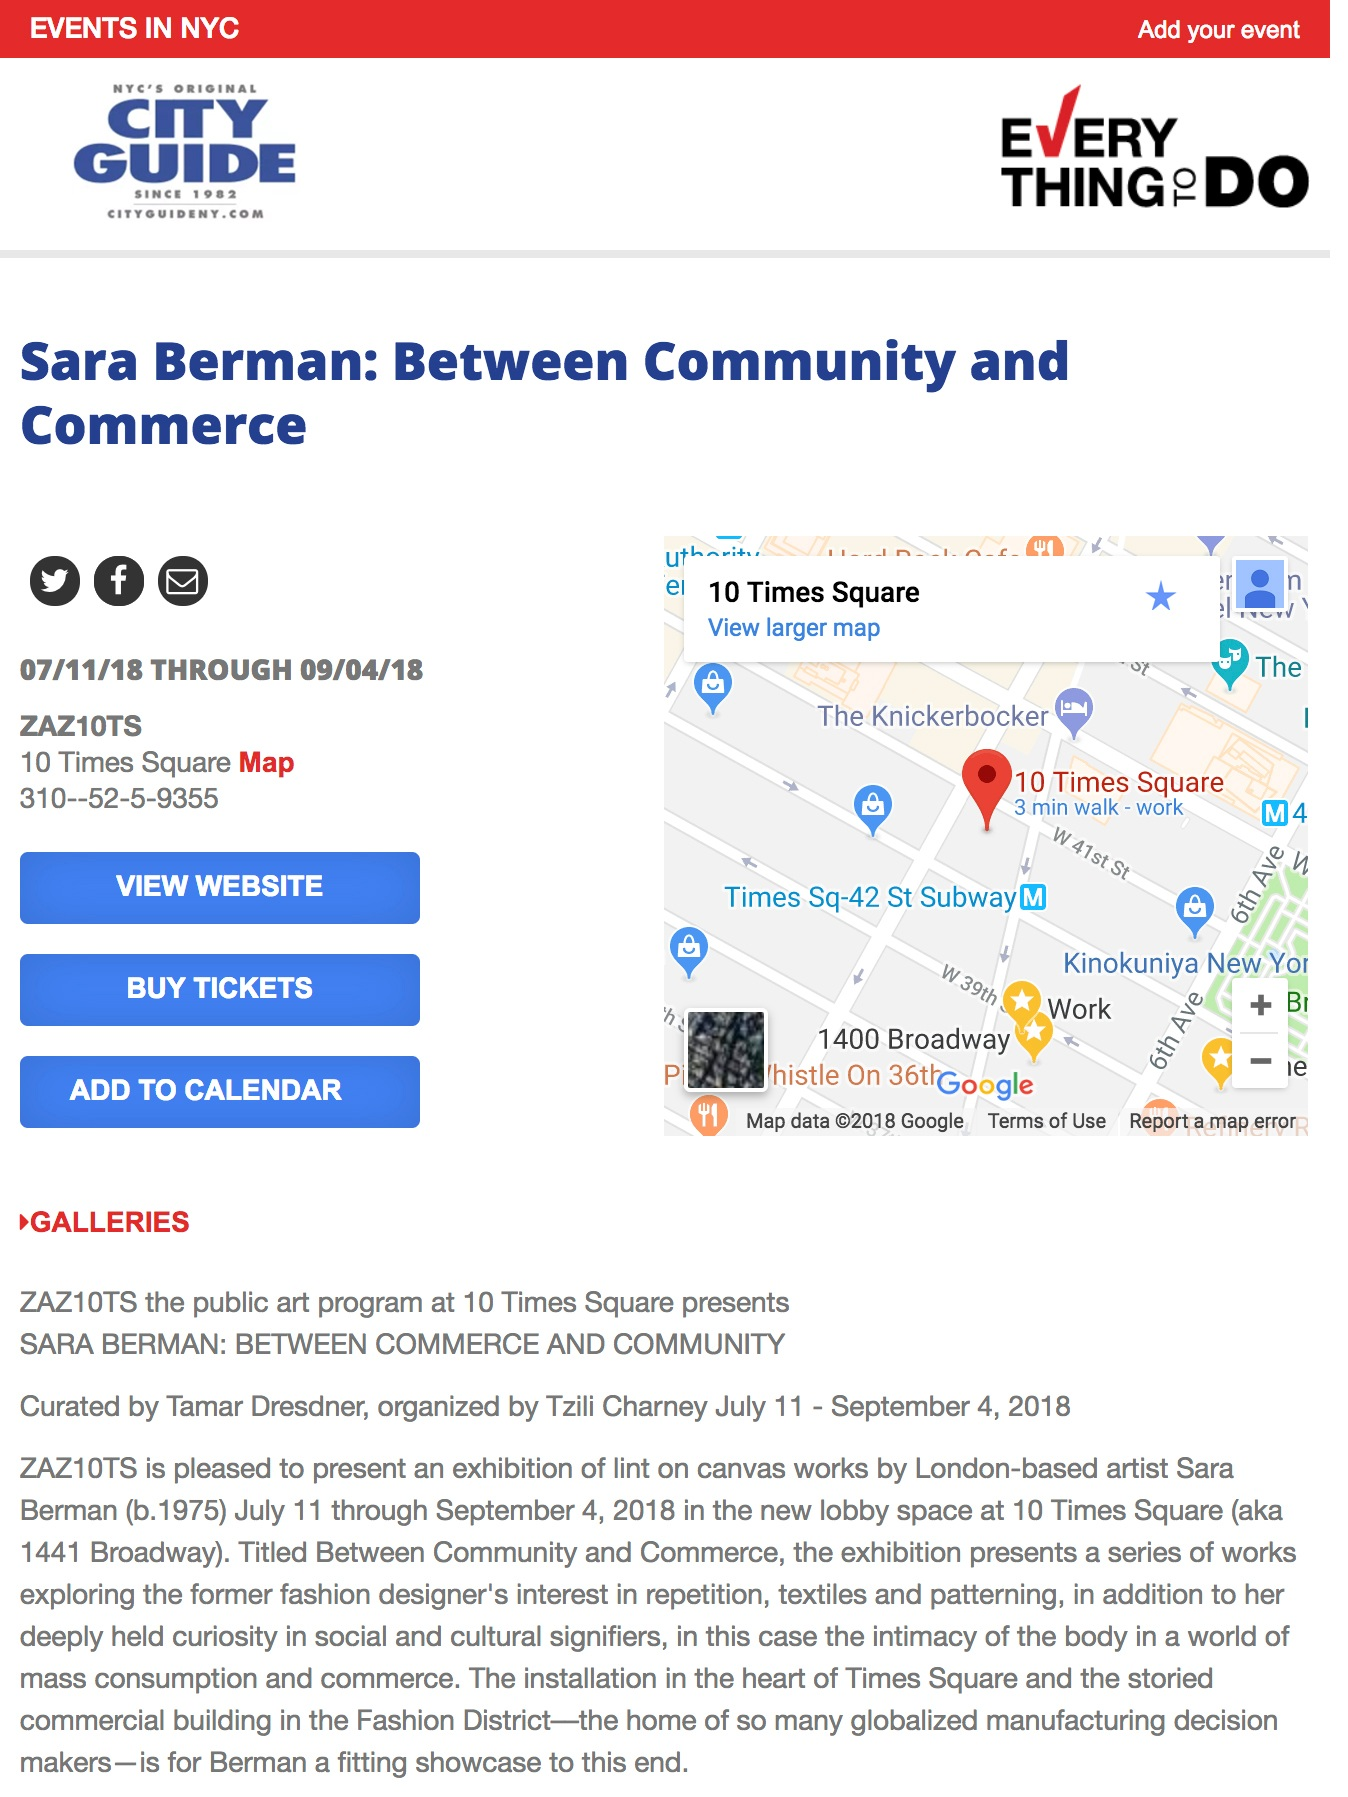 CITY GUIDE  Sara Berman: Between Community and Commerce (July 11, 2018)